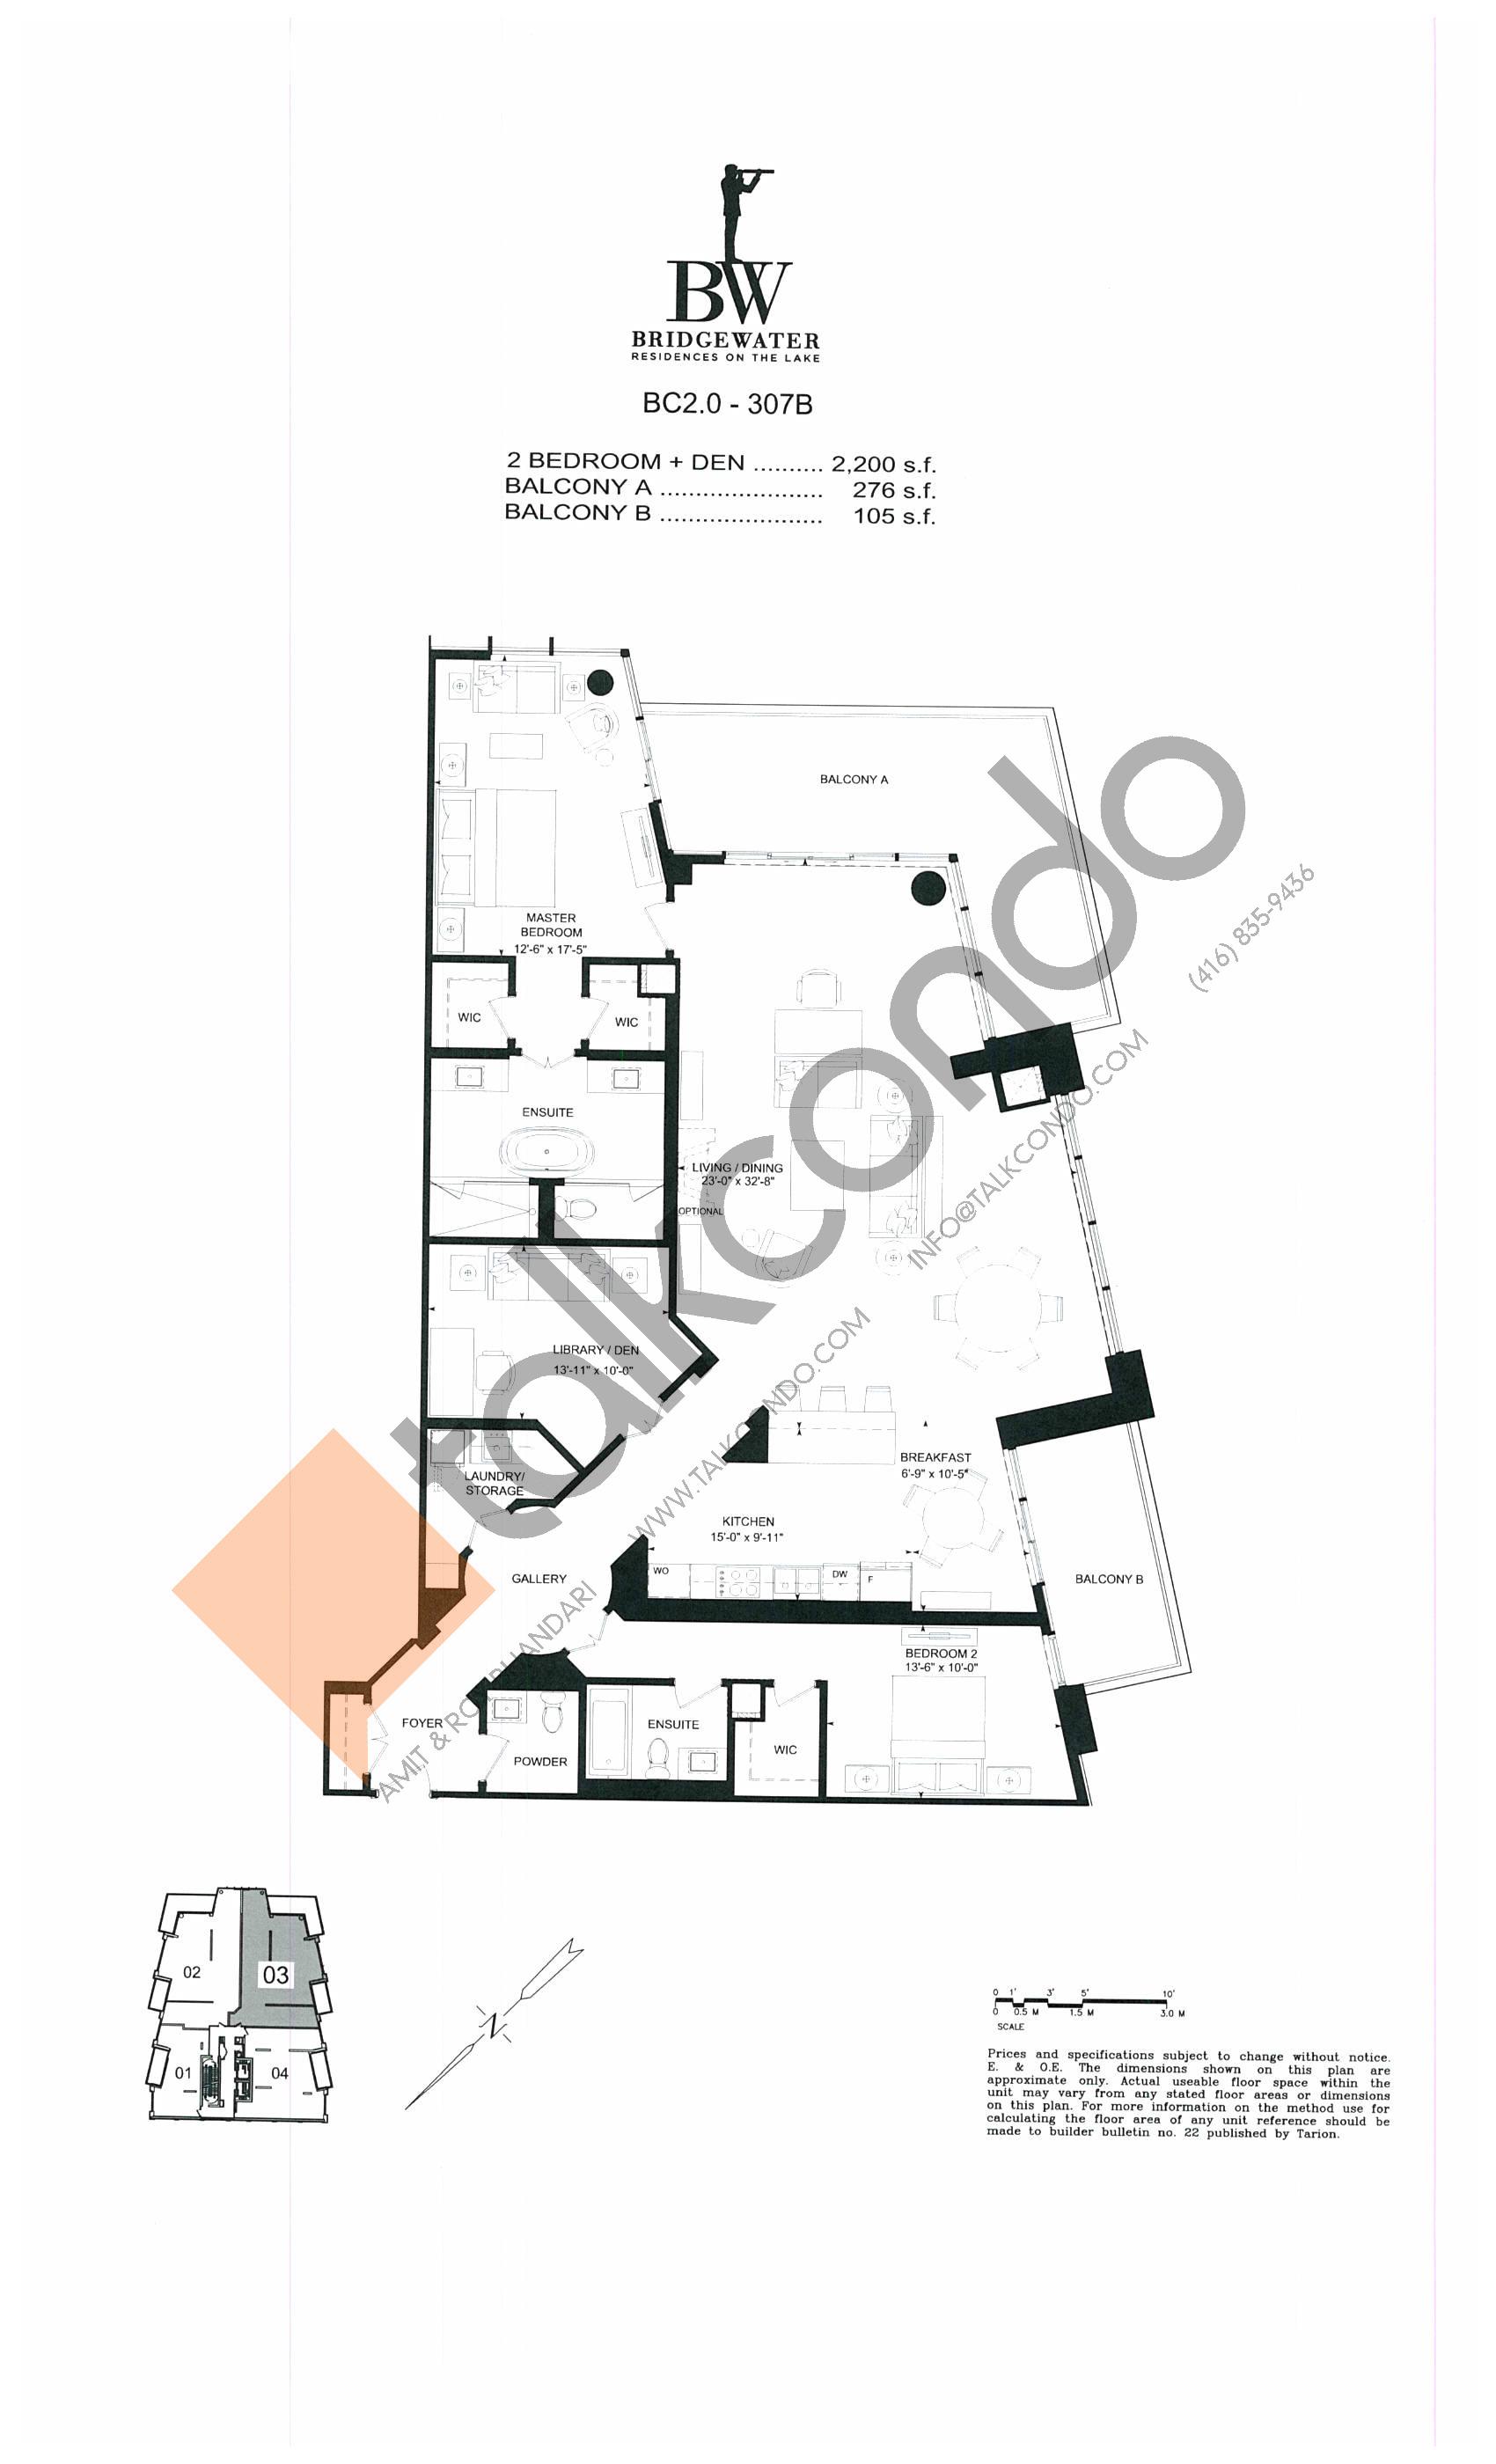 2,200 sq. ft. Floor Plan at Bridgewater Residences on the Lake Condos - 2200 sq.ft